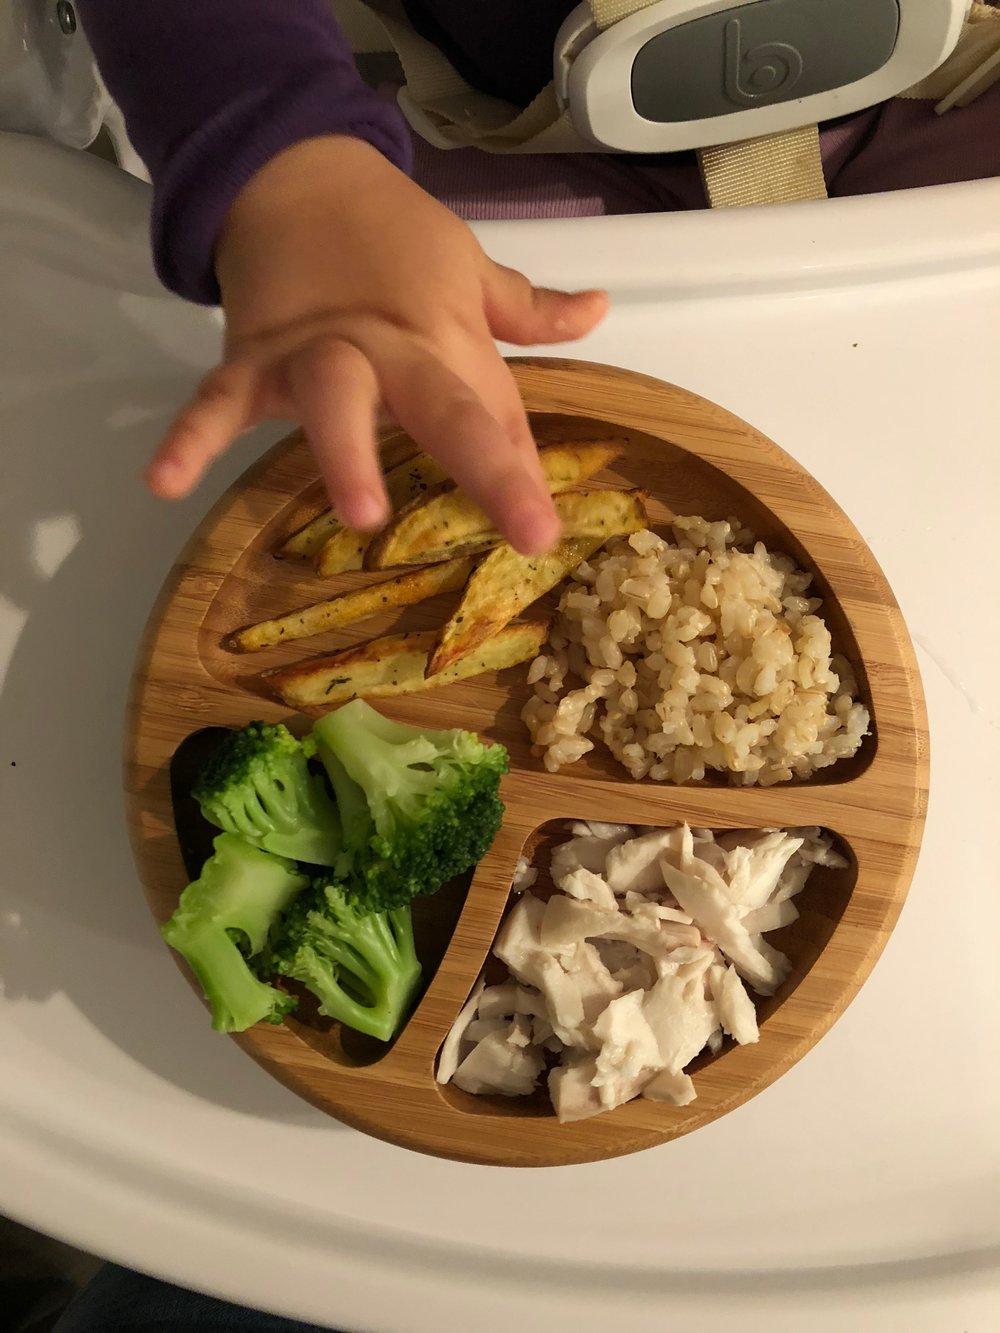 Brócoli al vapor, pescado mahi mahi, un poquito de arroz integral y papitas al horno.